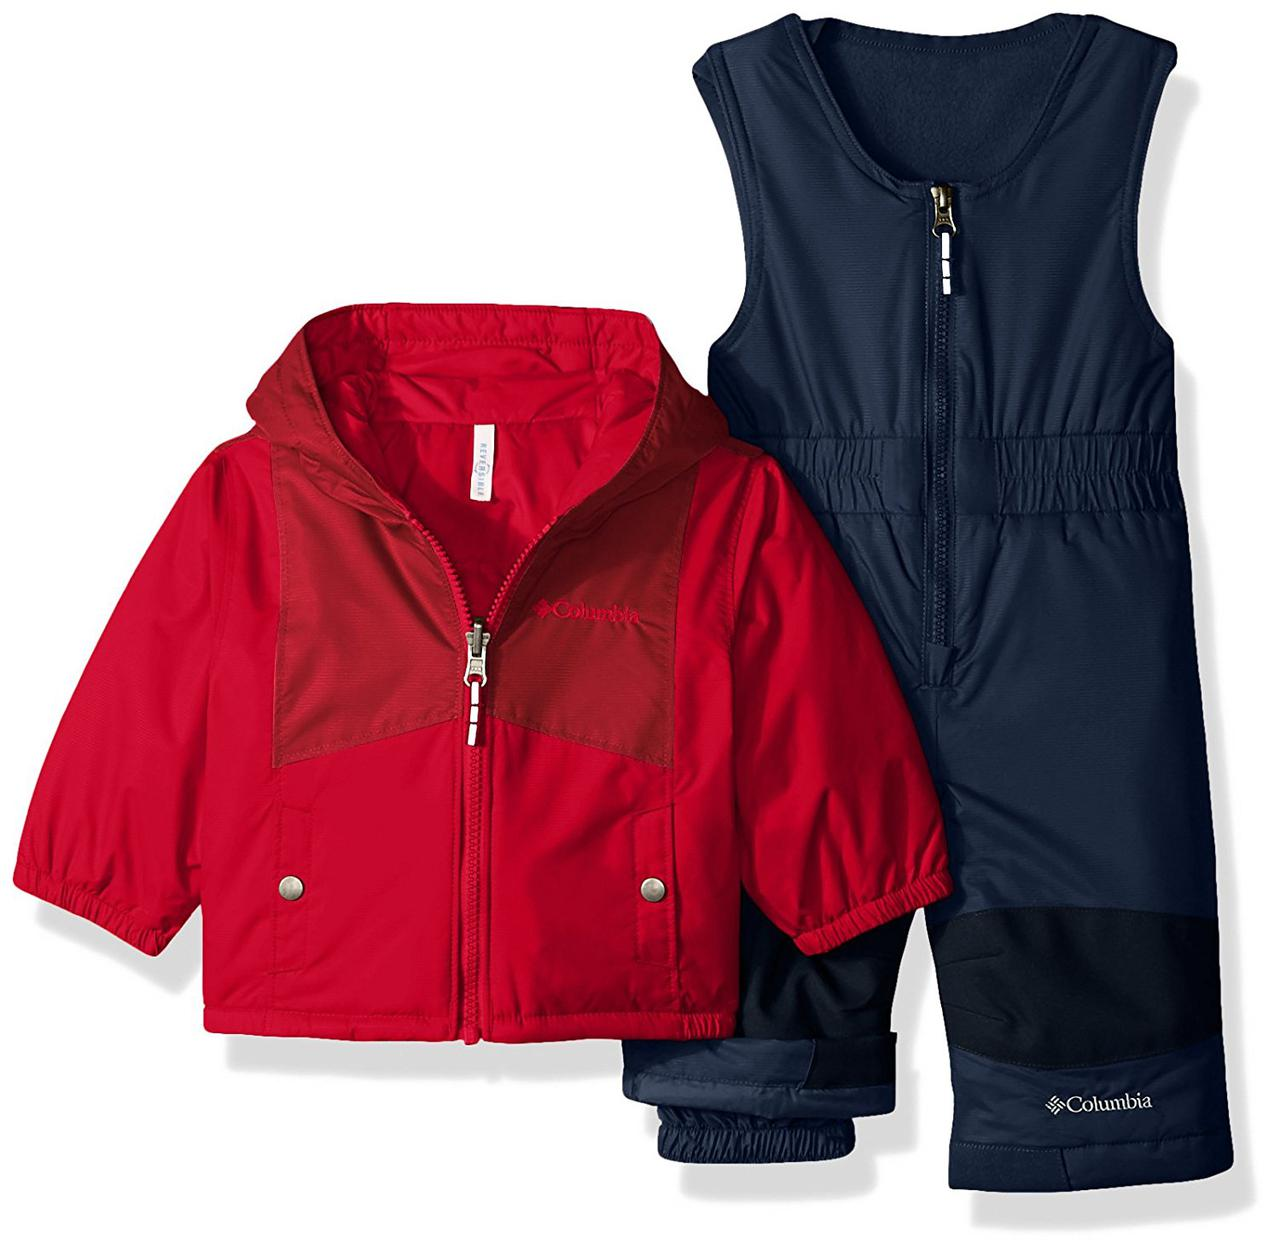 Зимний термо костюм - полукомбинезон и куртка Columbia для мальчика ... 4d417cce6a9e5